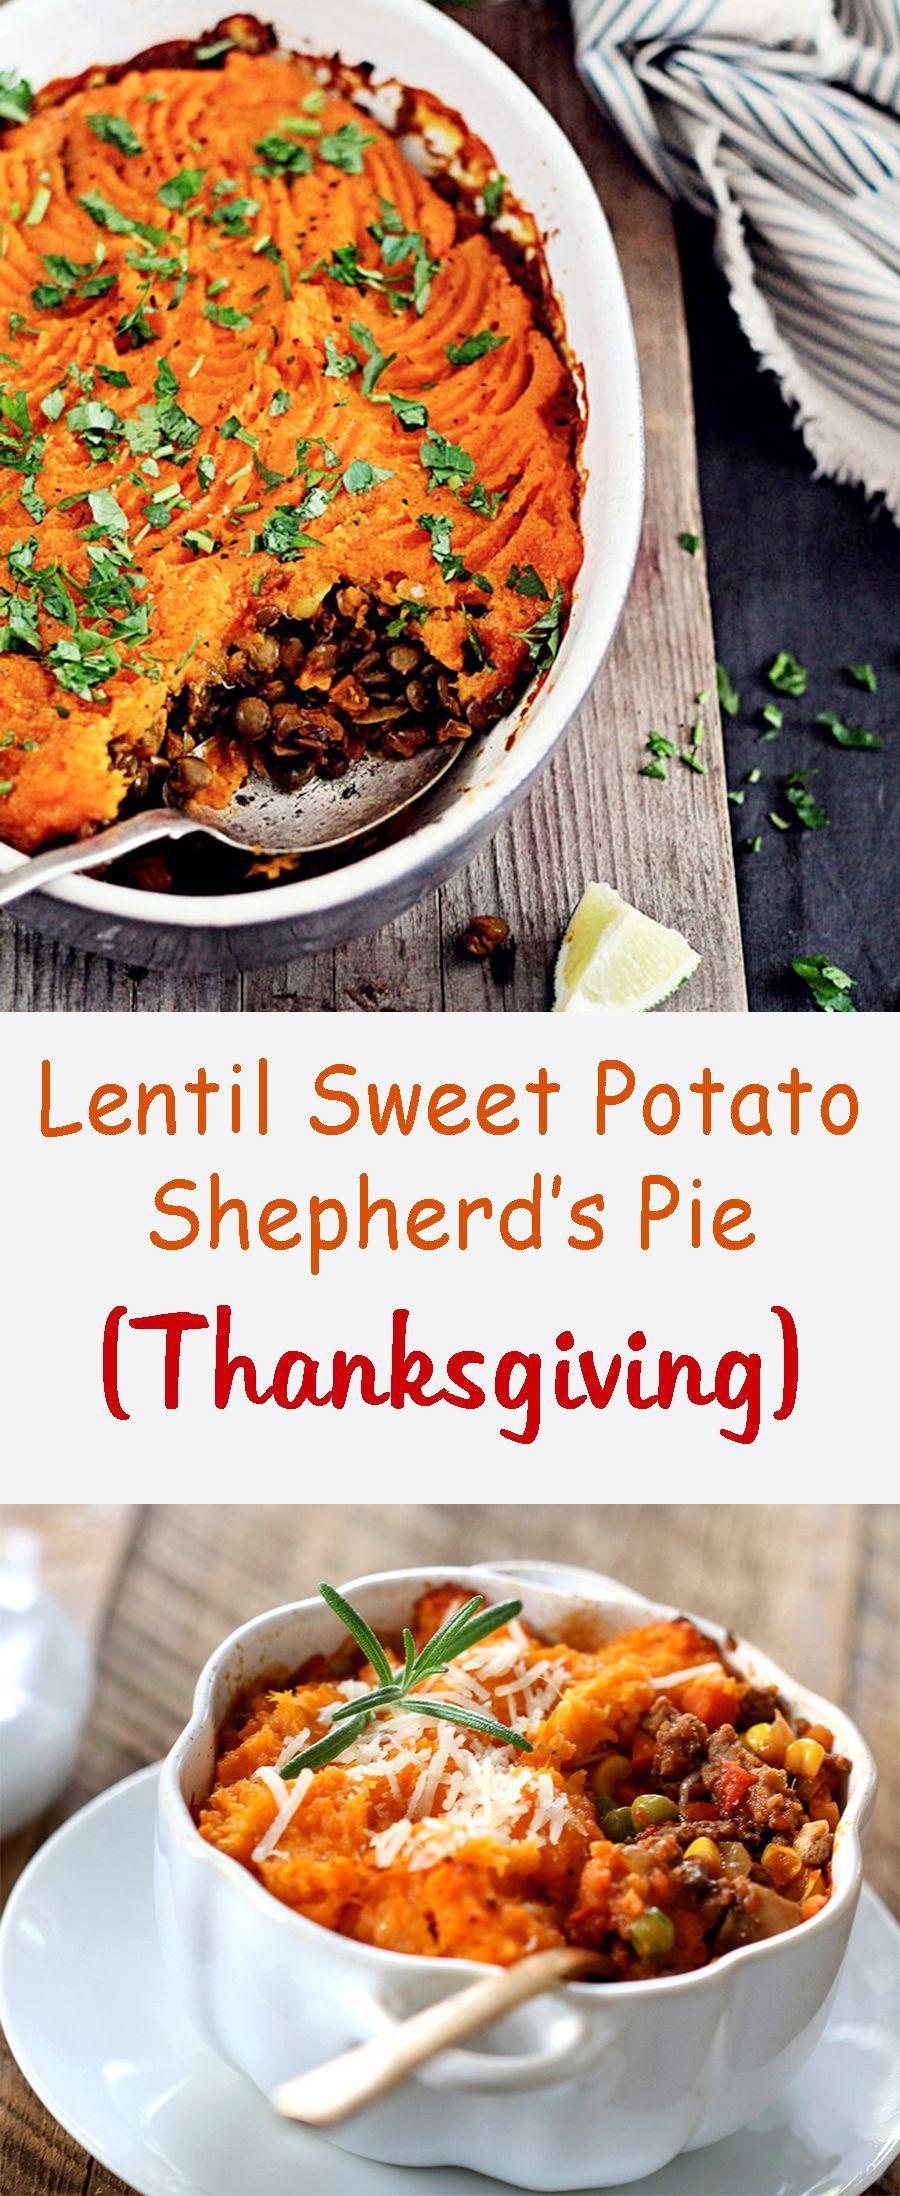 Vegan Lentil Shepherd S Pie With Sweet Potato Mash Recipe In 2020 Vegan Shepherds Pie Vegan Recipes Easy Mashed Sweet Potatoes